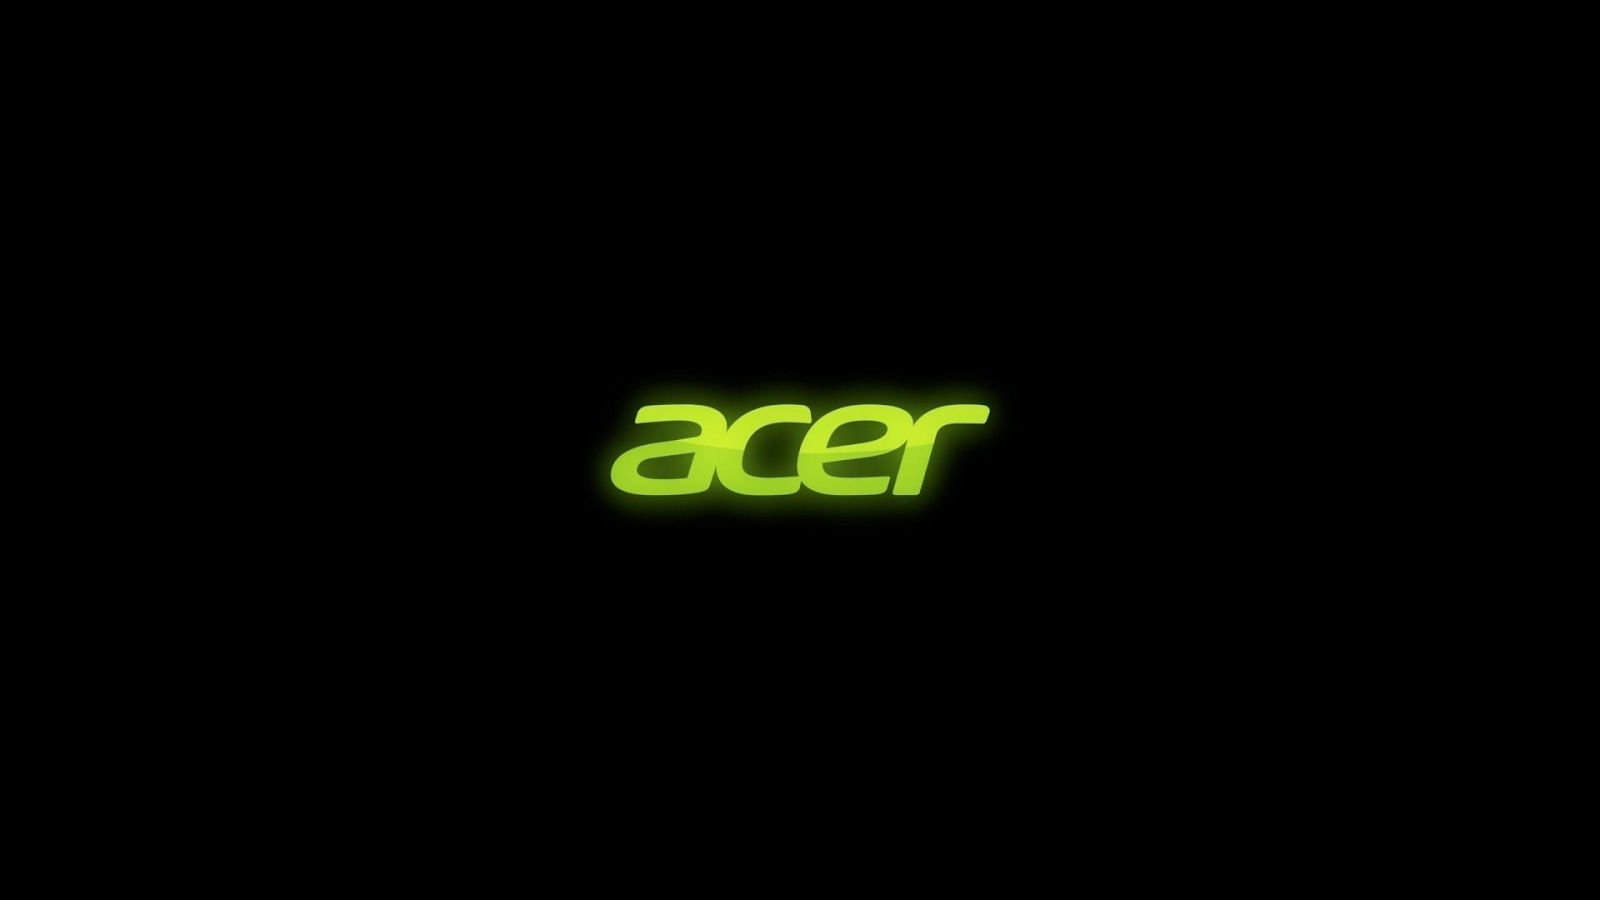 Dark Acer Logo Wallpapers - Wallpaper Cave